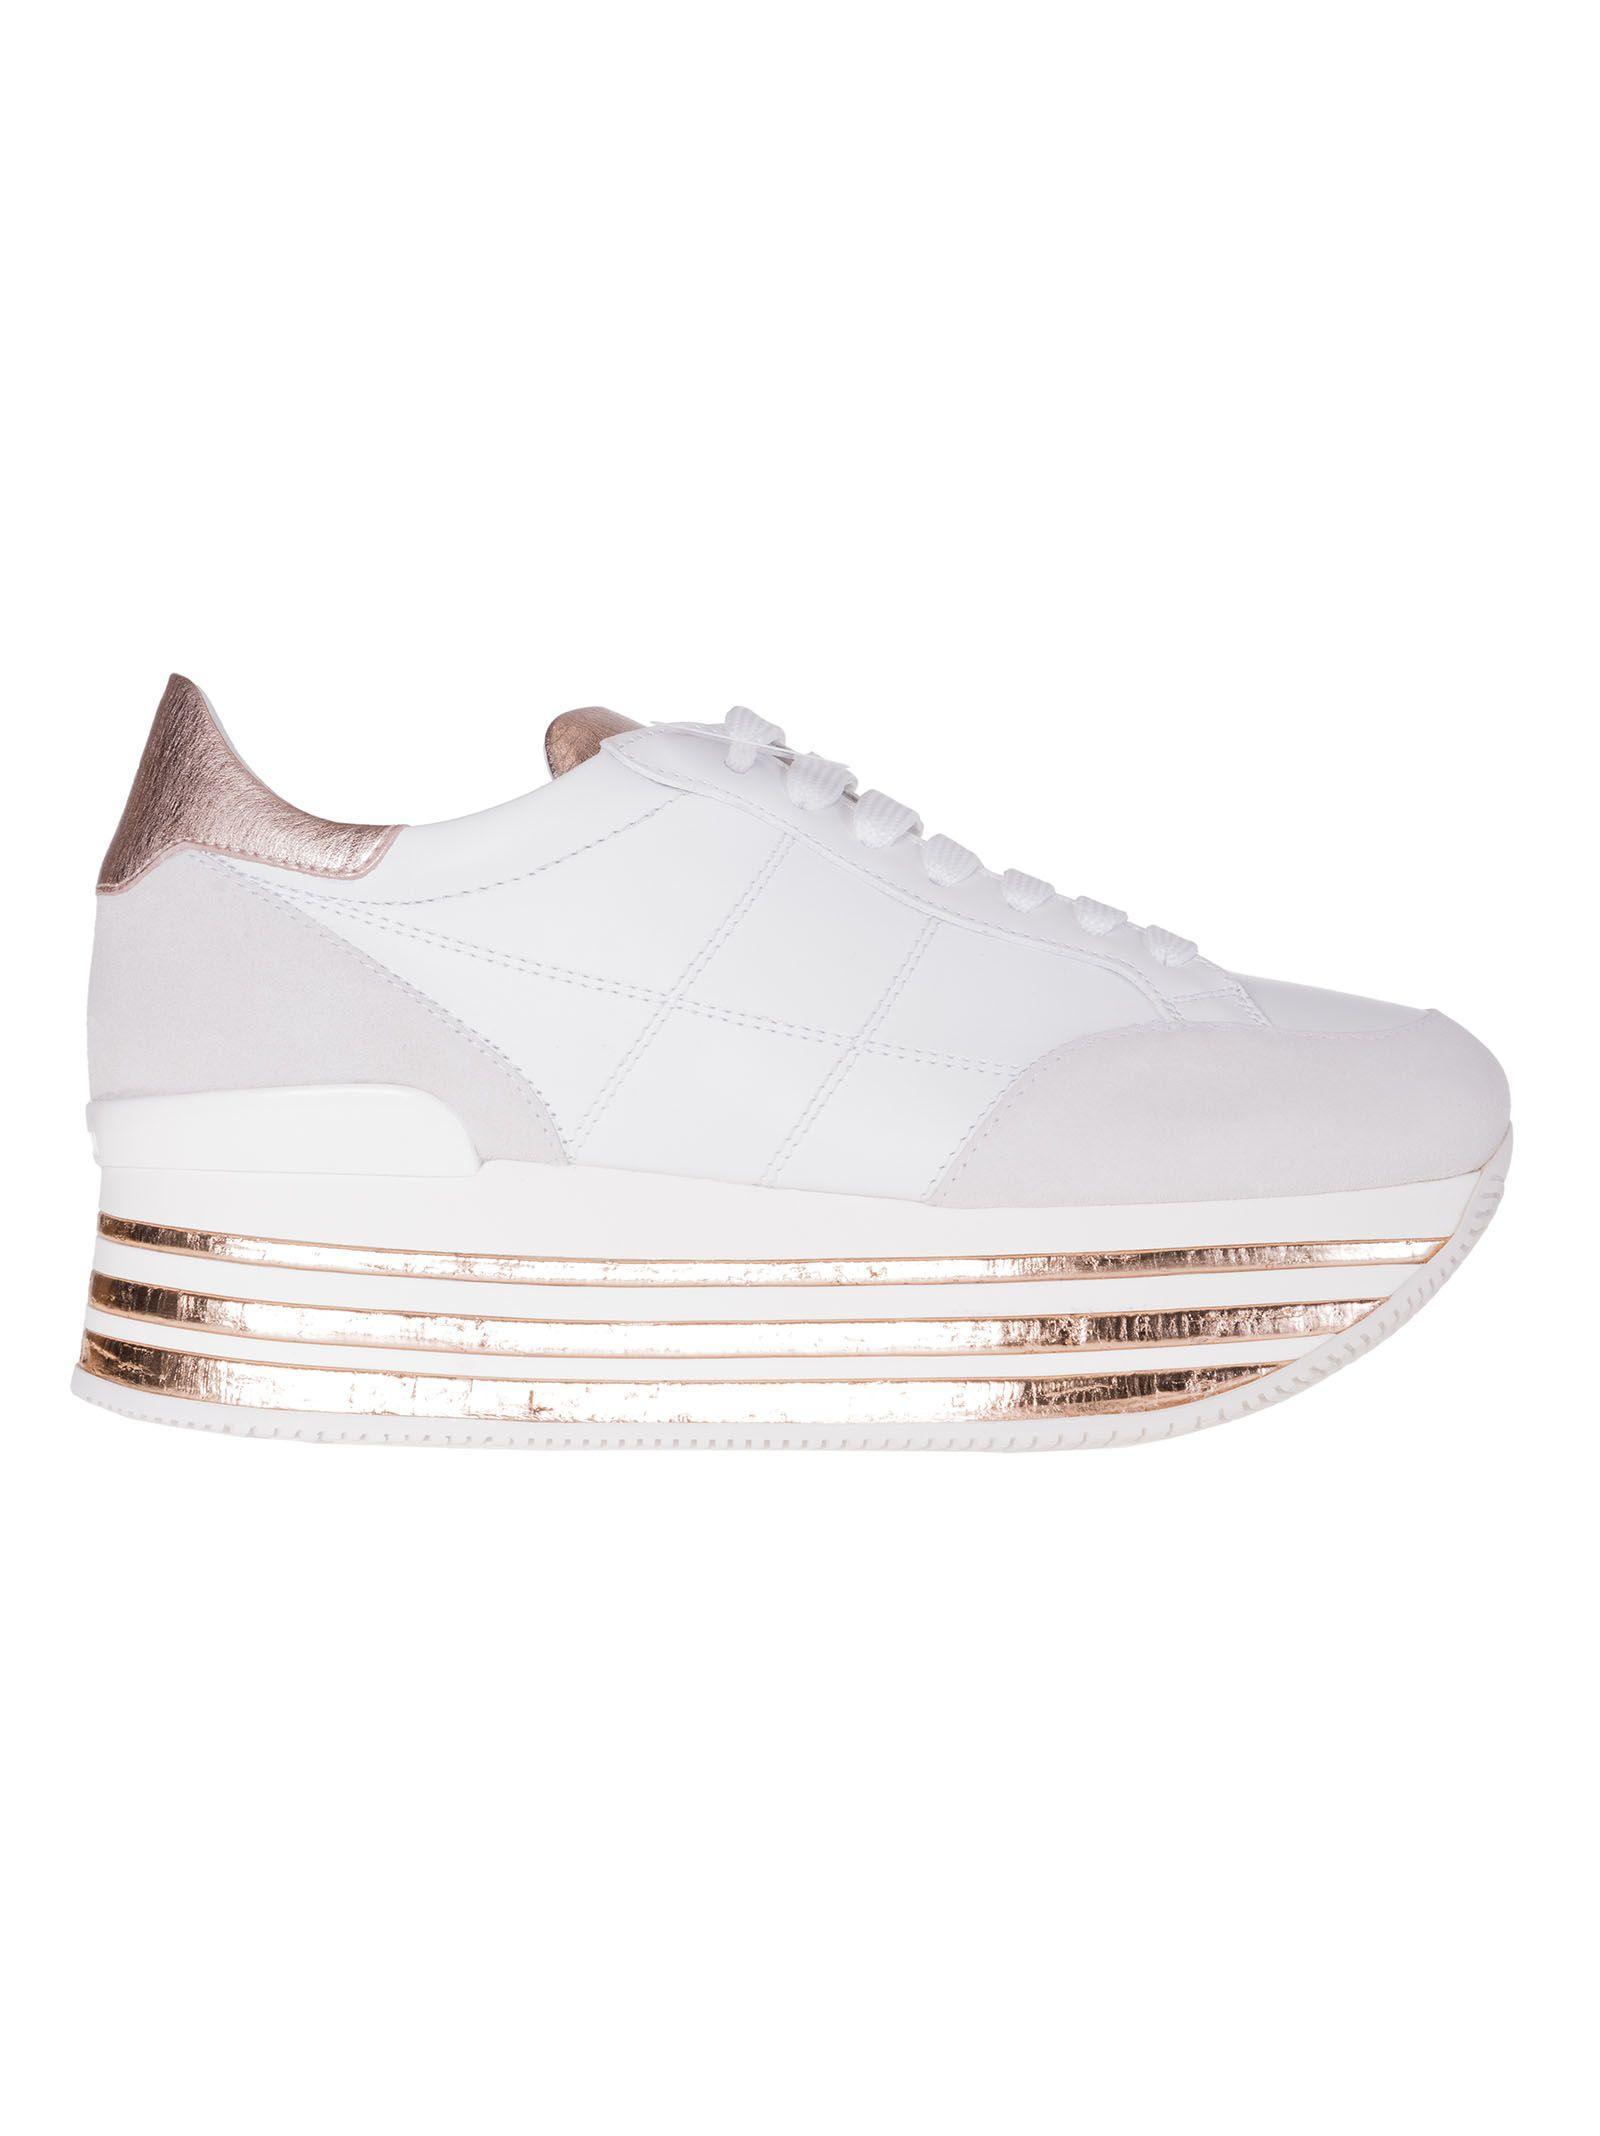 Hogan H349 Maxip Micro Sneakers Shop Sale Online b9m2lUDe